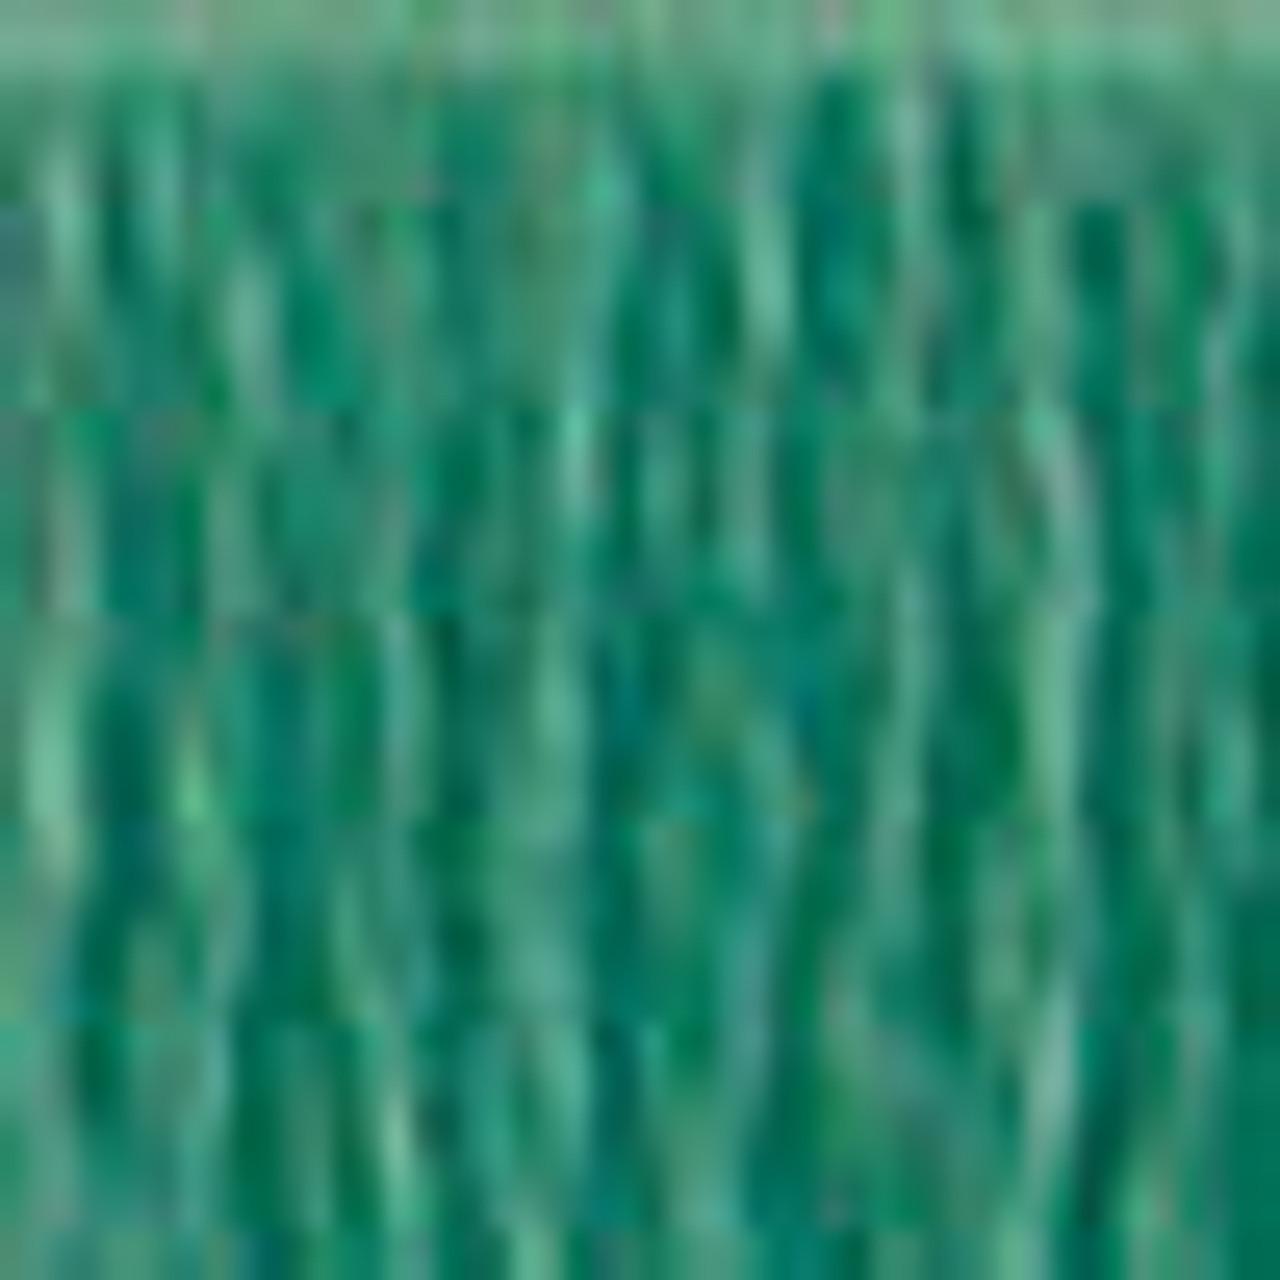 DMC # 3815 Dark Celadon Green Floss / Thread